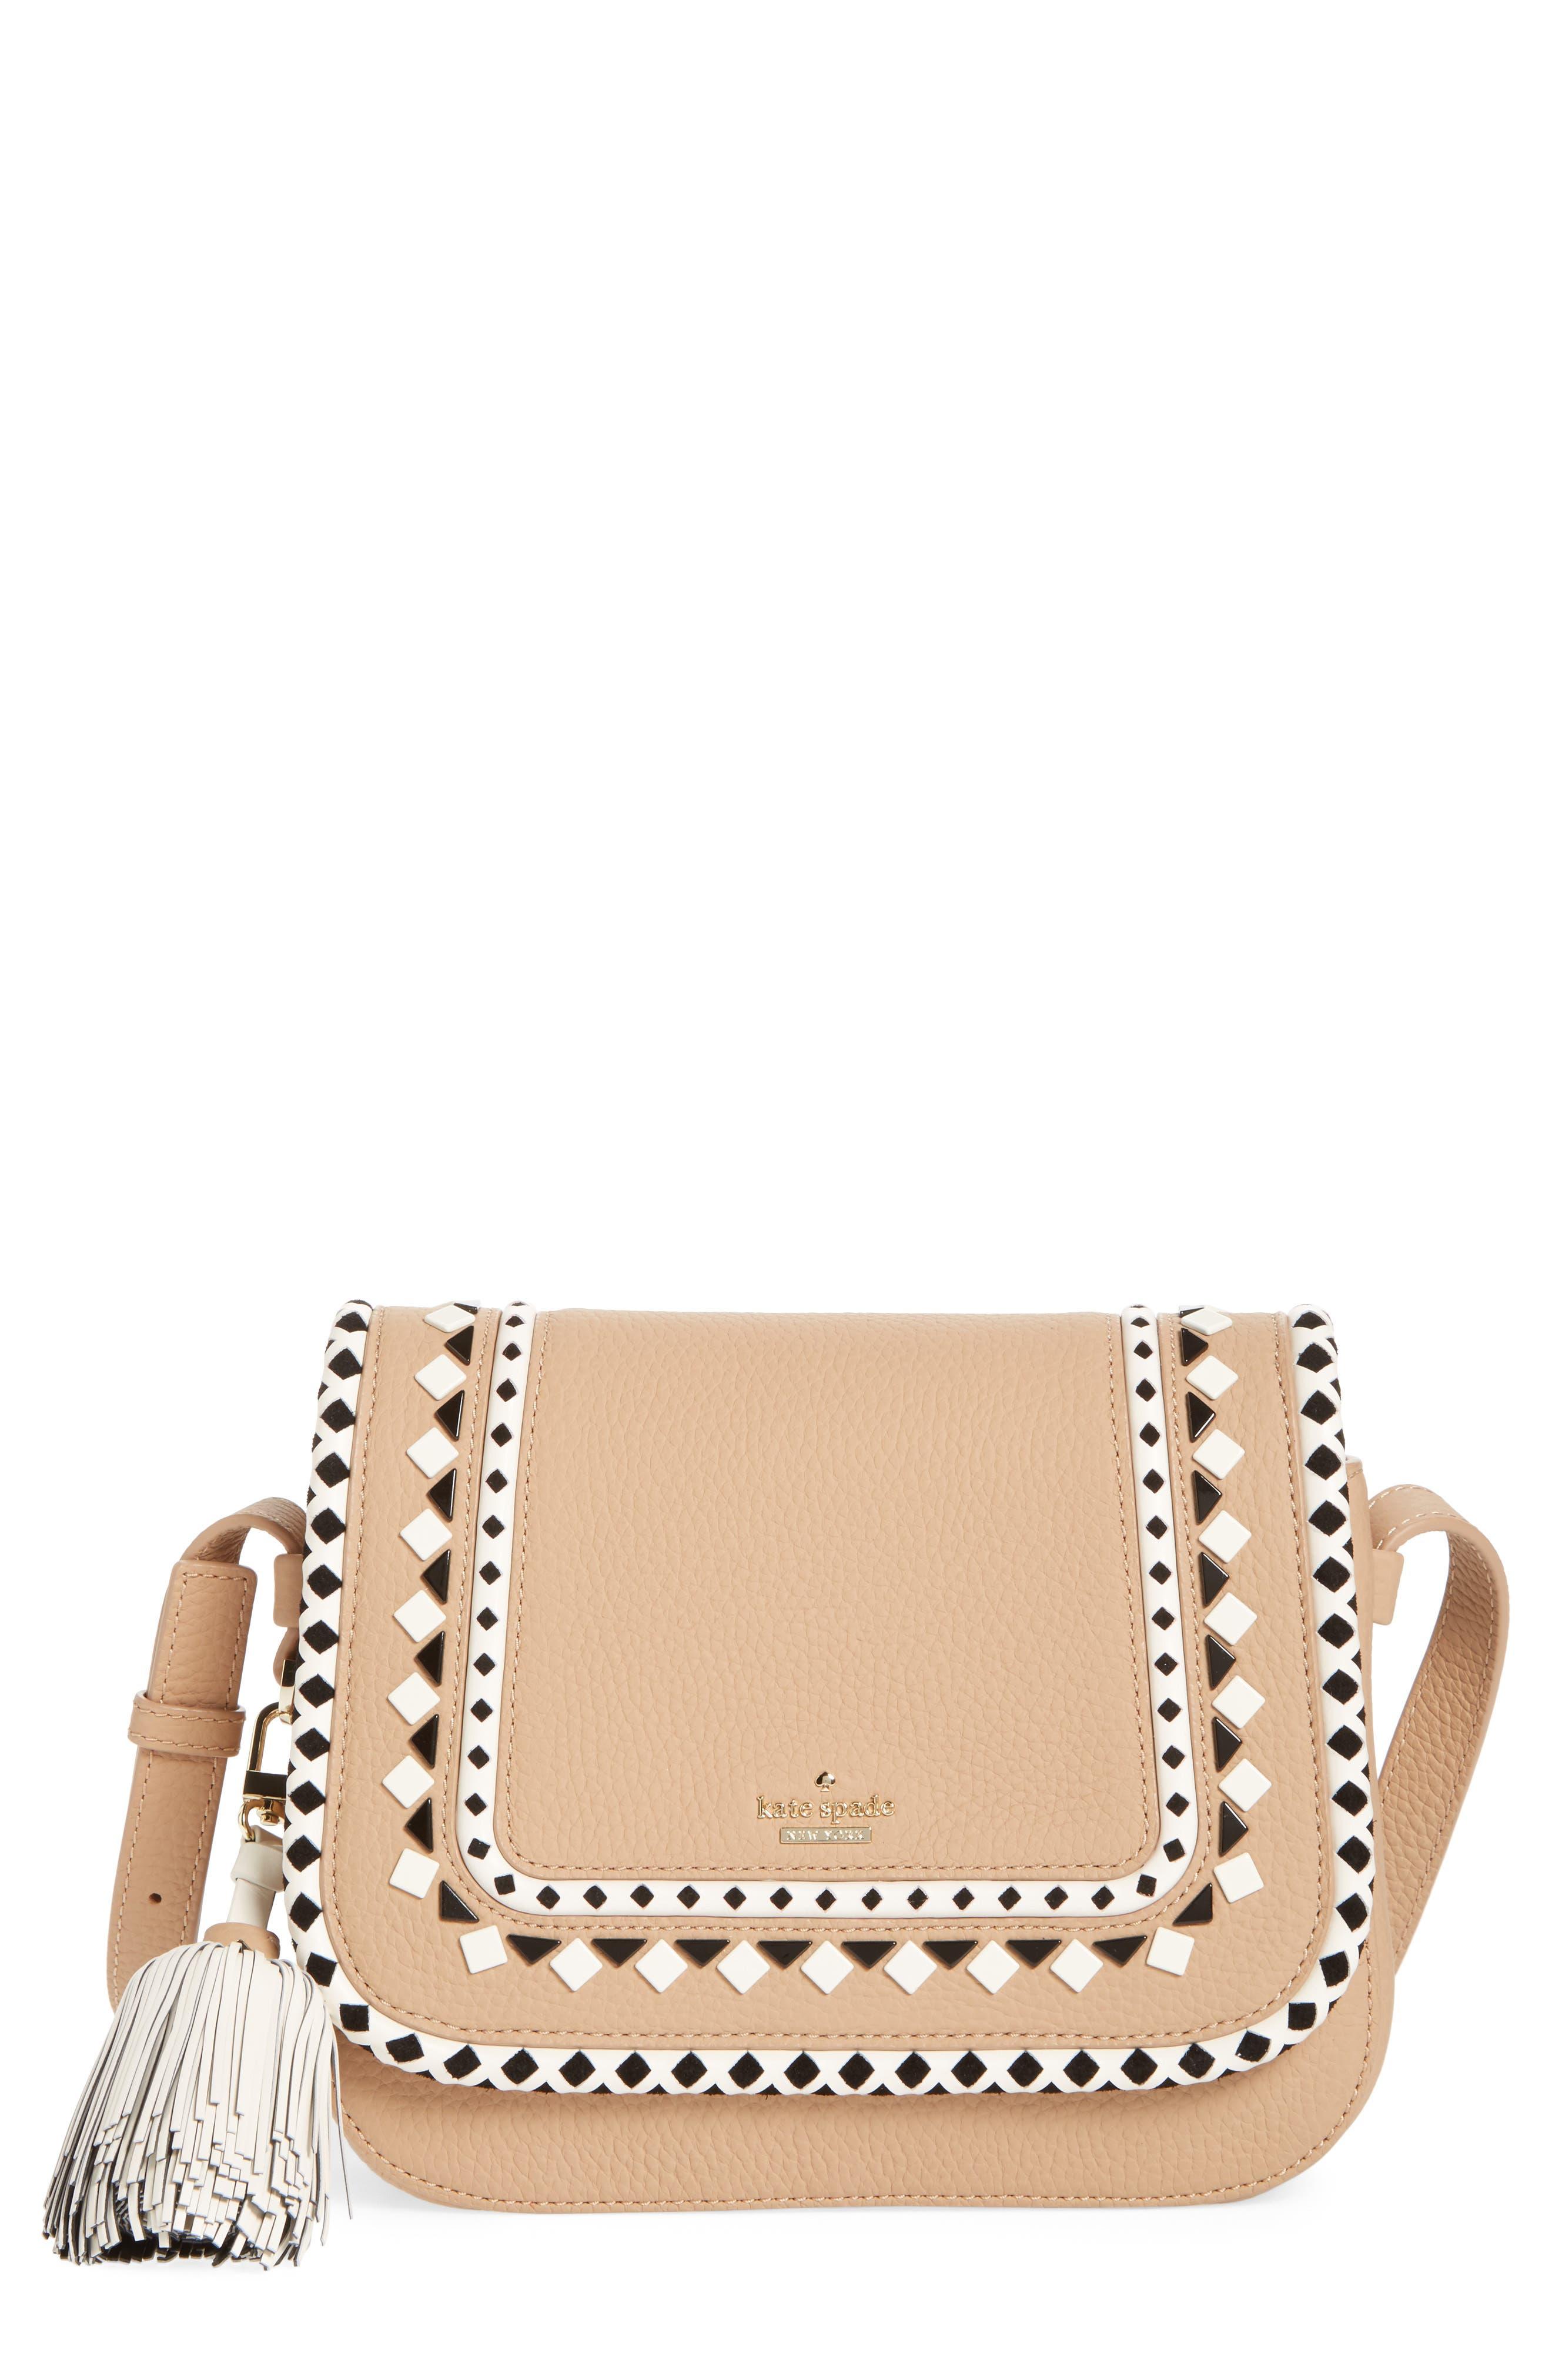 KATE SPADE NEW YORK crown street - jasper leather saddle bag